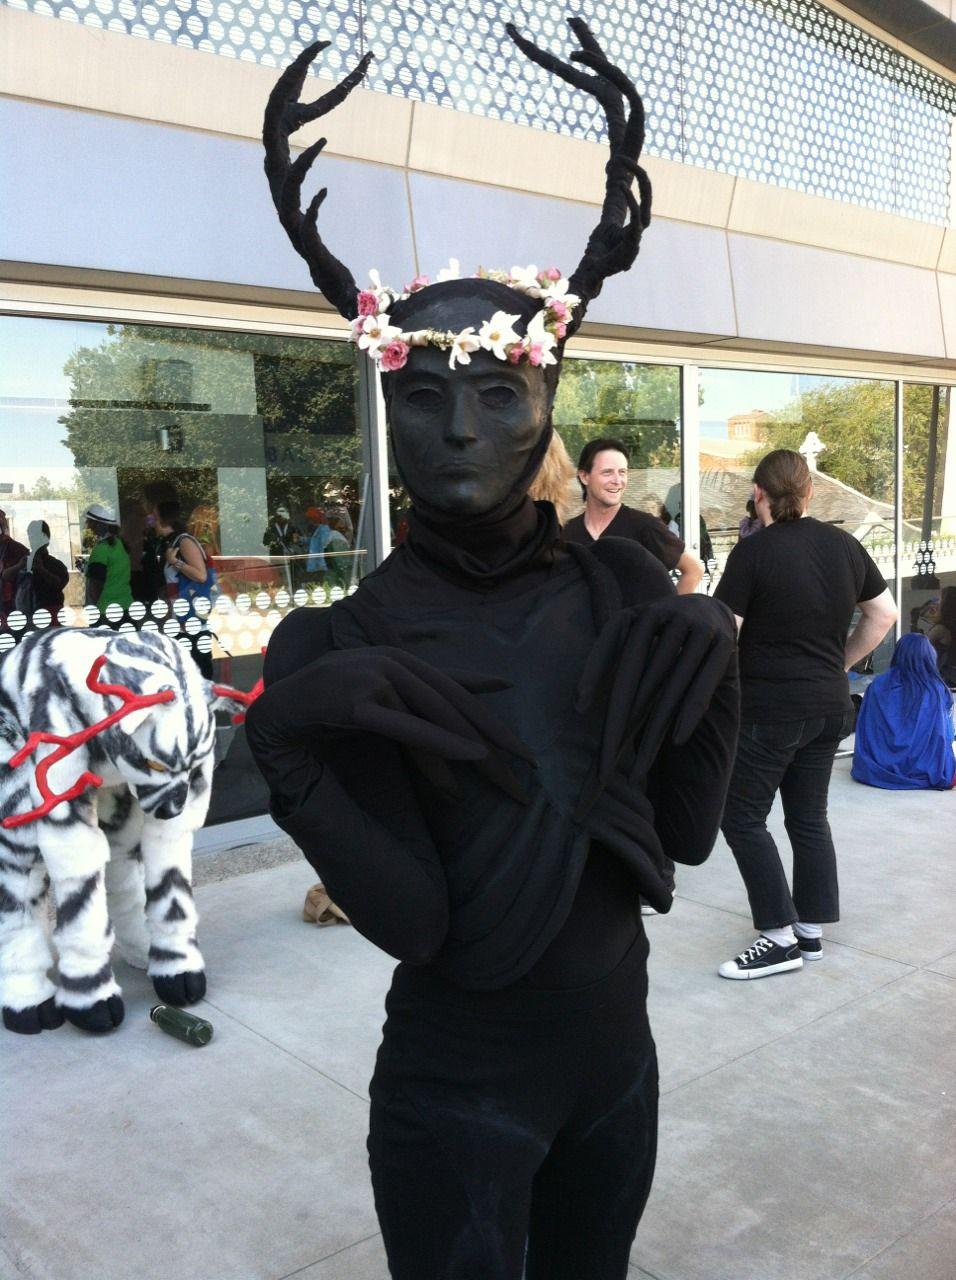 hannibal wendigo cosplay - Google Search & hannibal wendigo cosplay - Google Search | Cool stuff | Pinterest